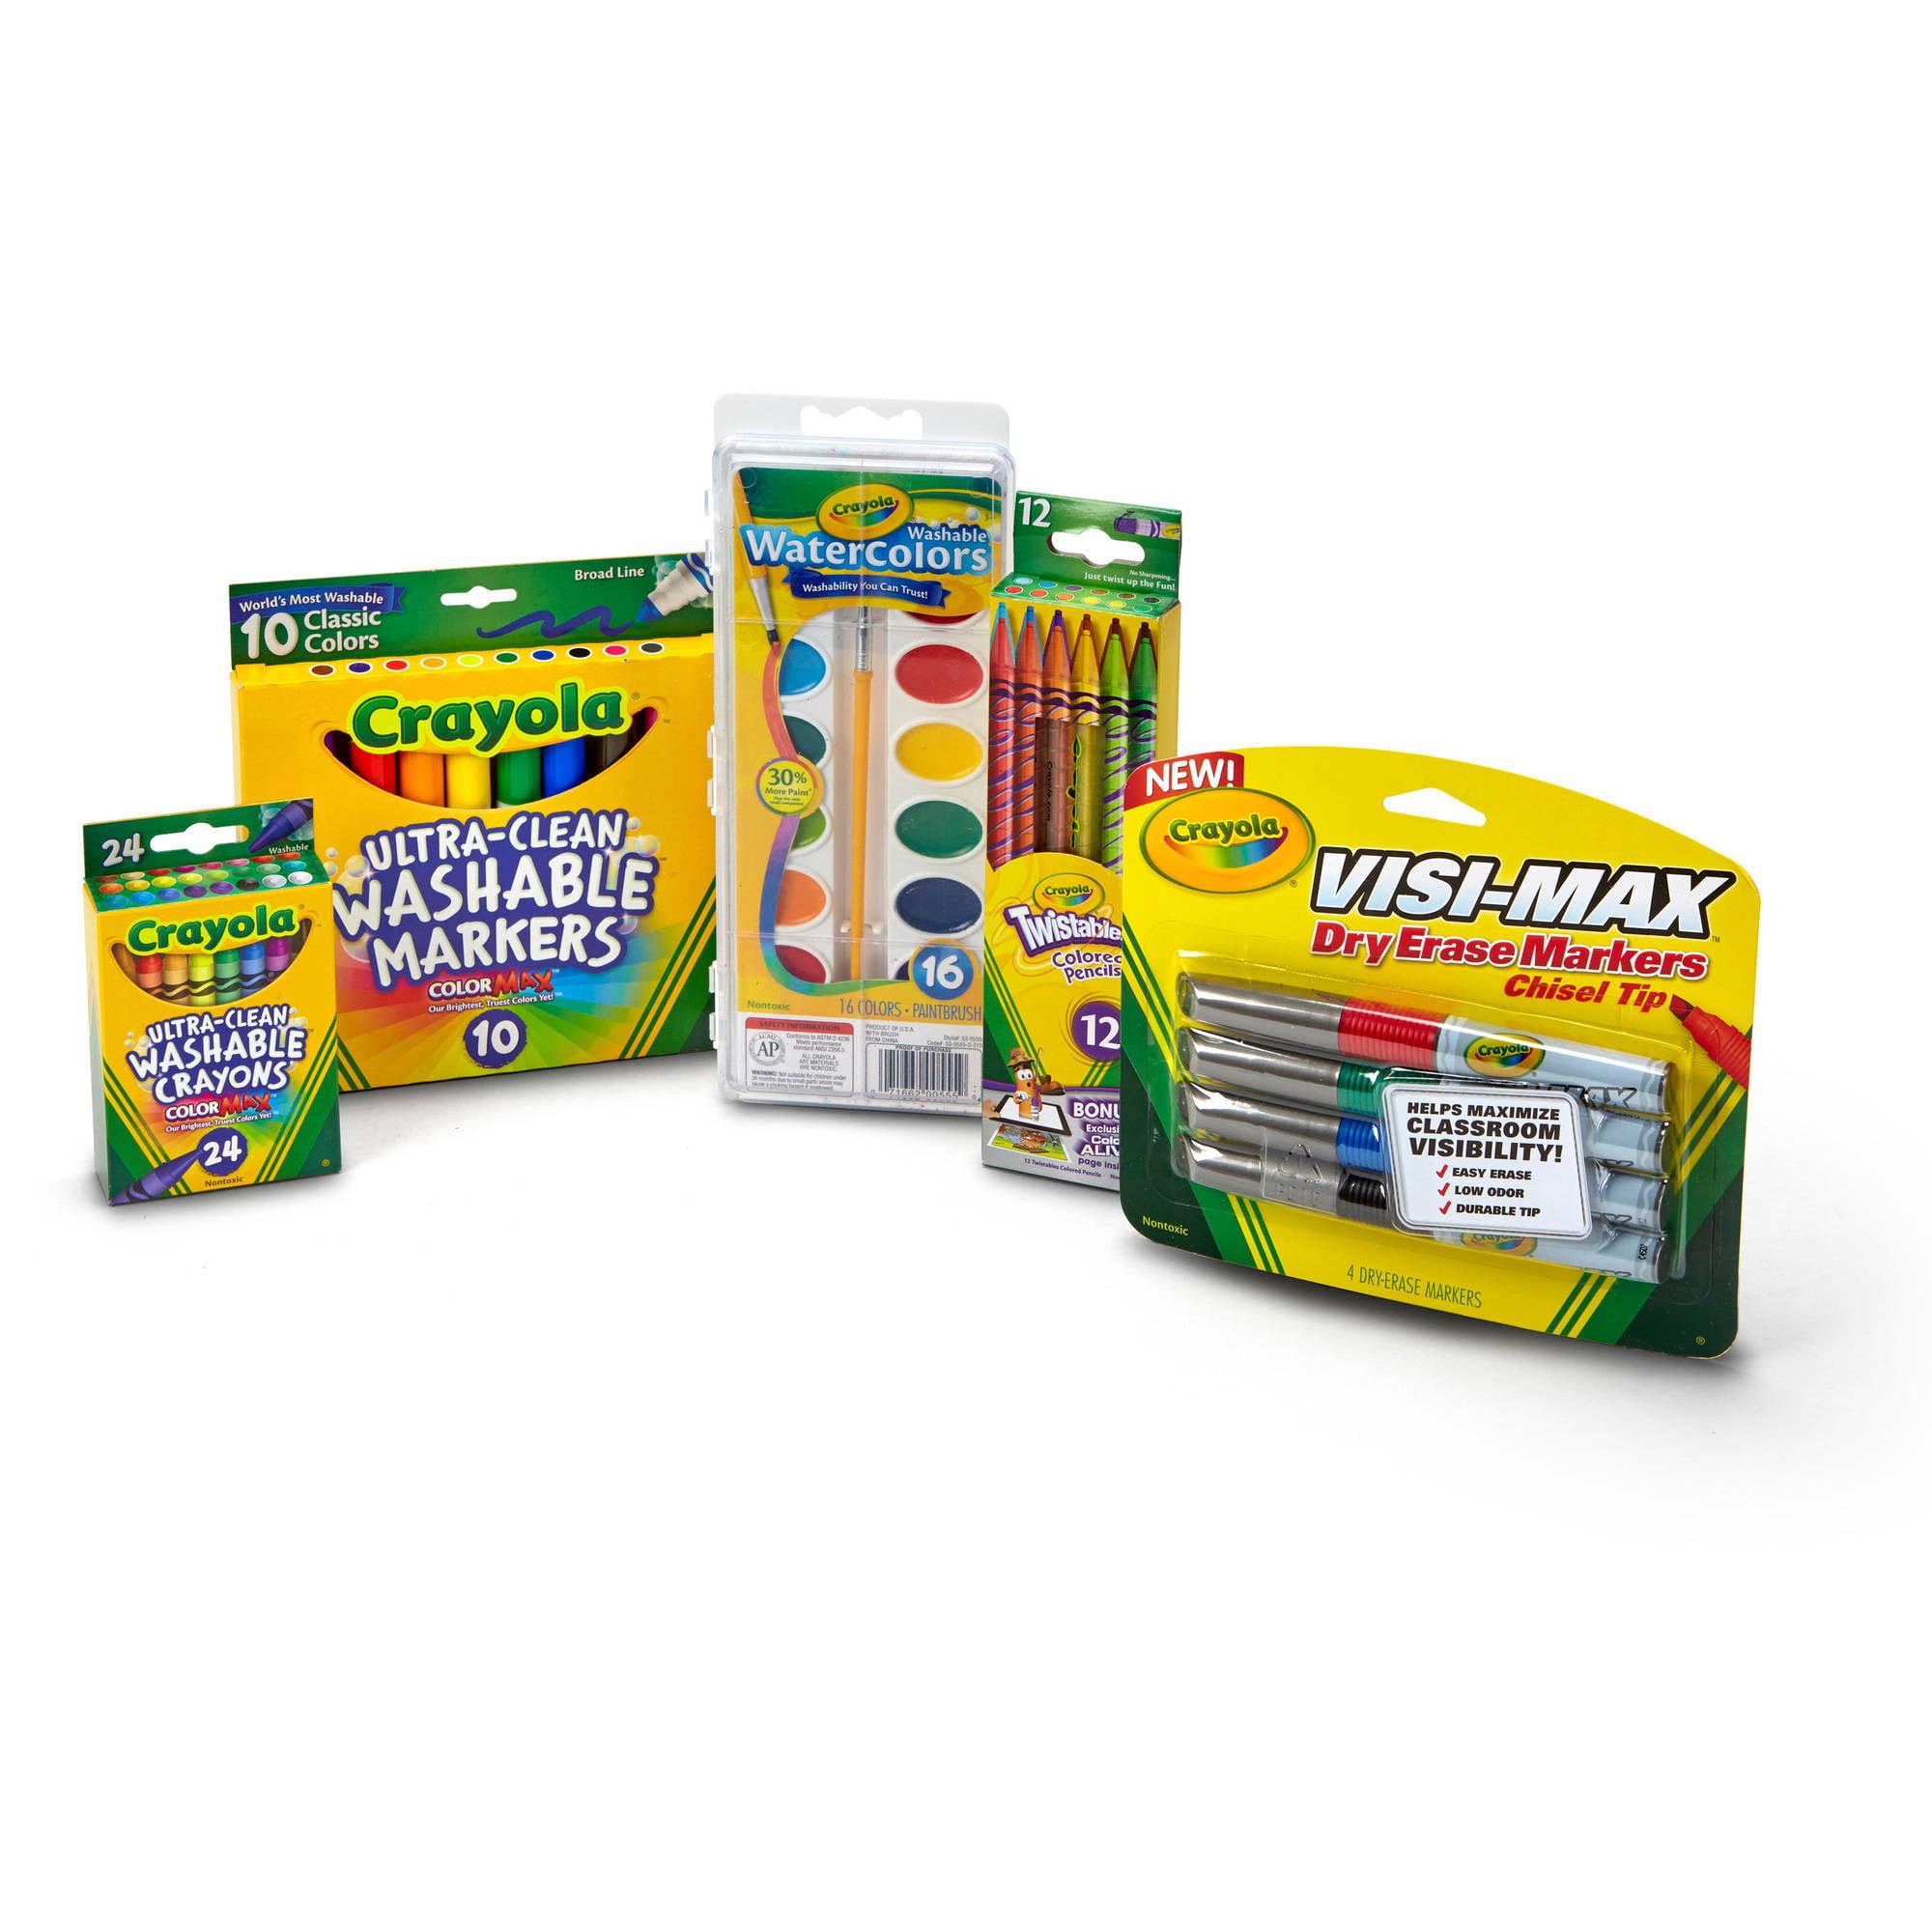 Crayola Back to School Art Set, Kids School Supplies, 60+ Pieces by Crayola